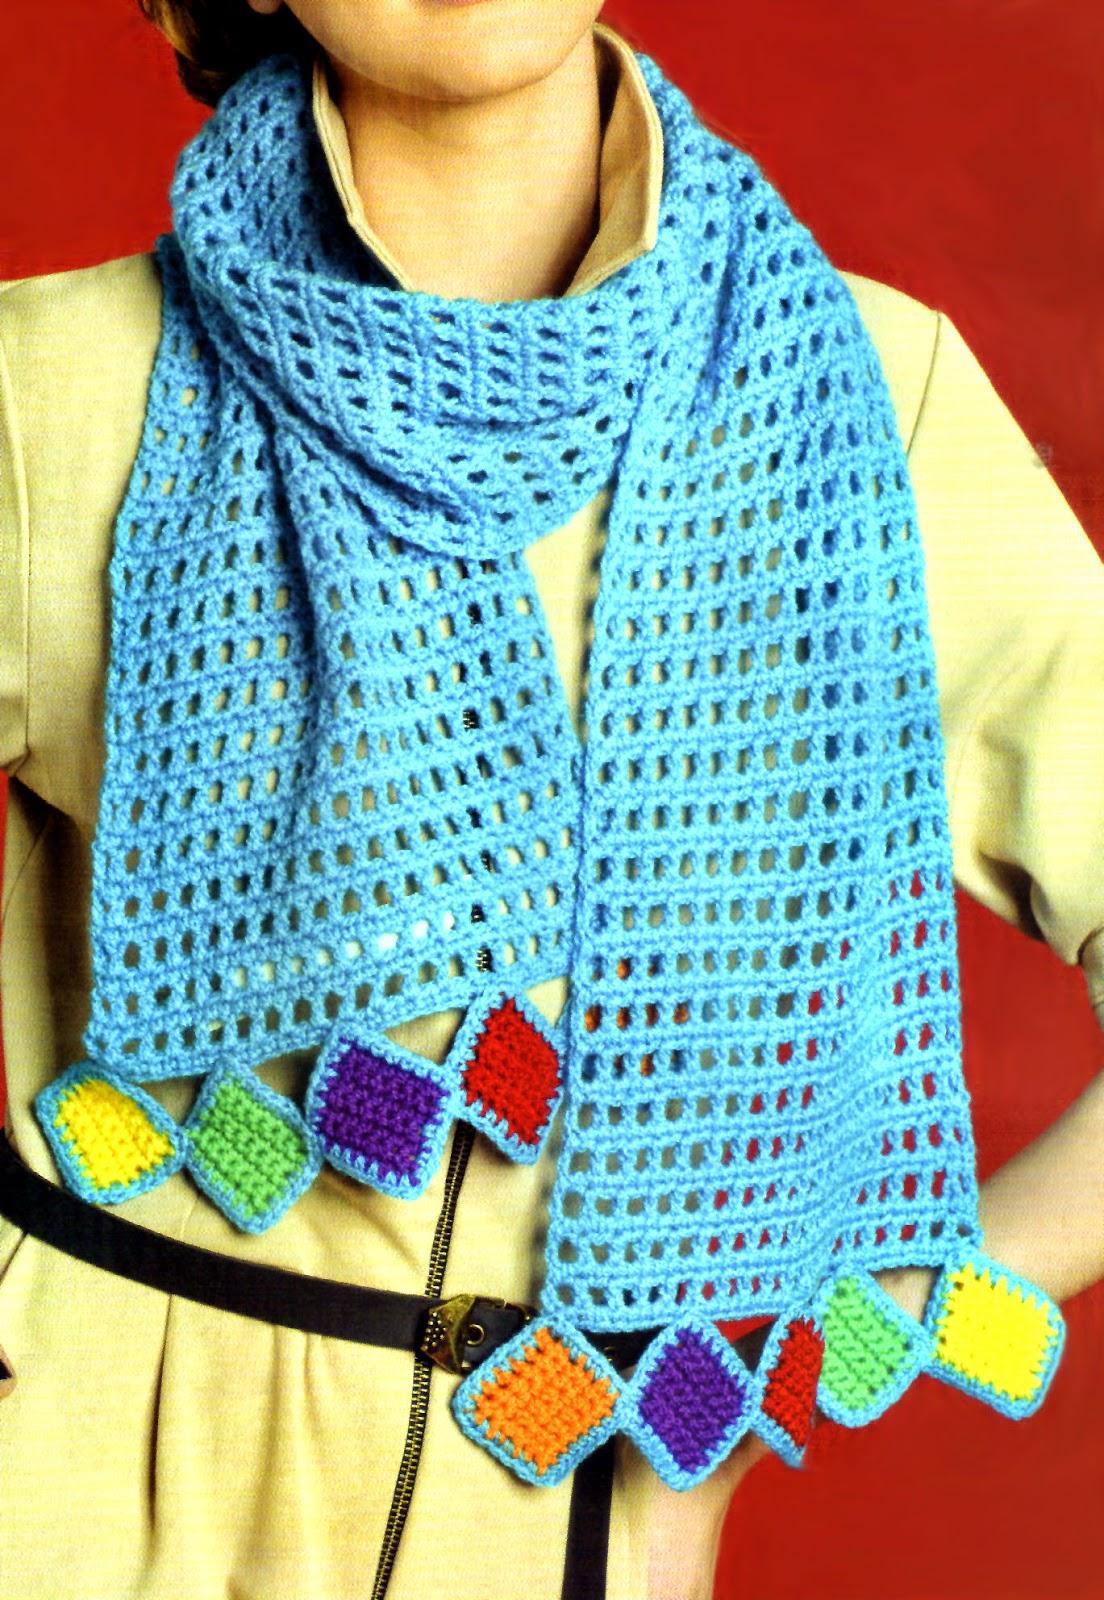 bufanda mosaico tejida en crochet